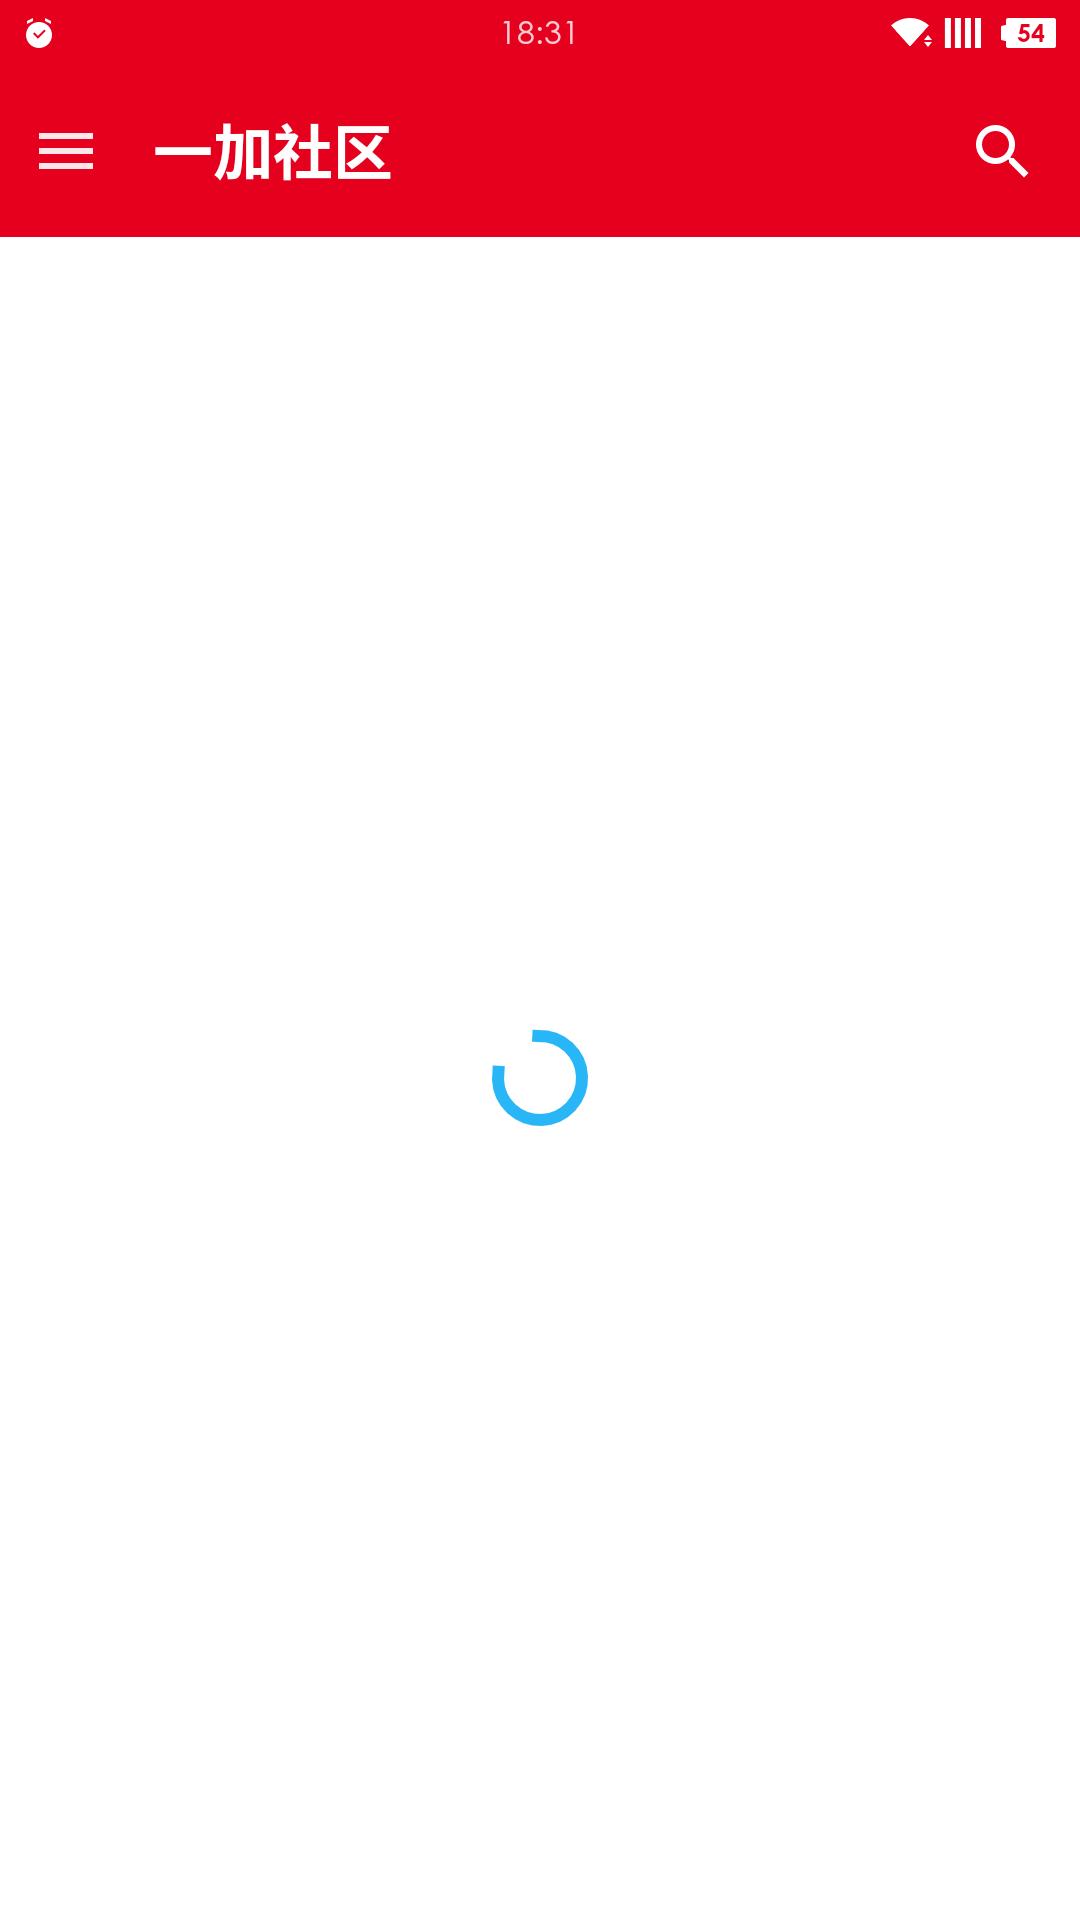 Screenshot_2015-12-15-18-31-44.png